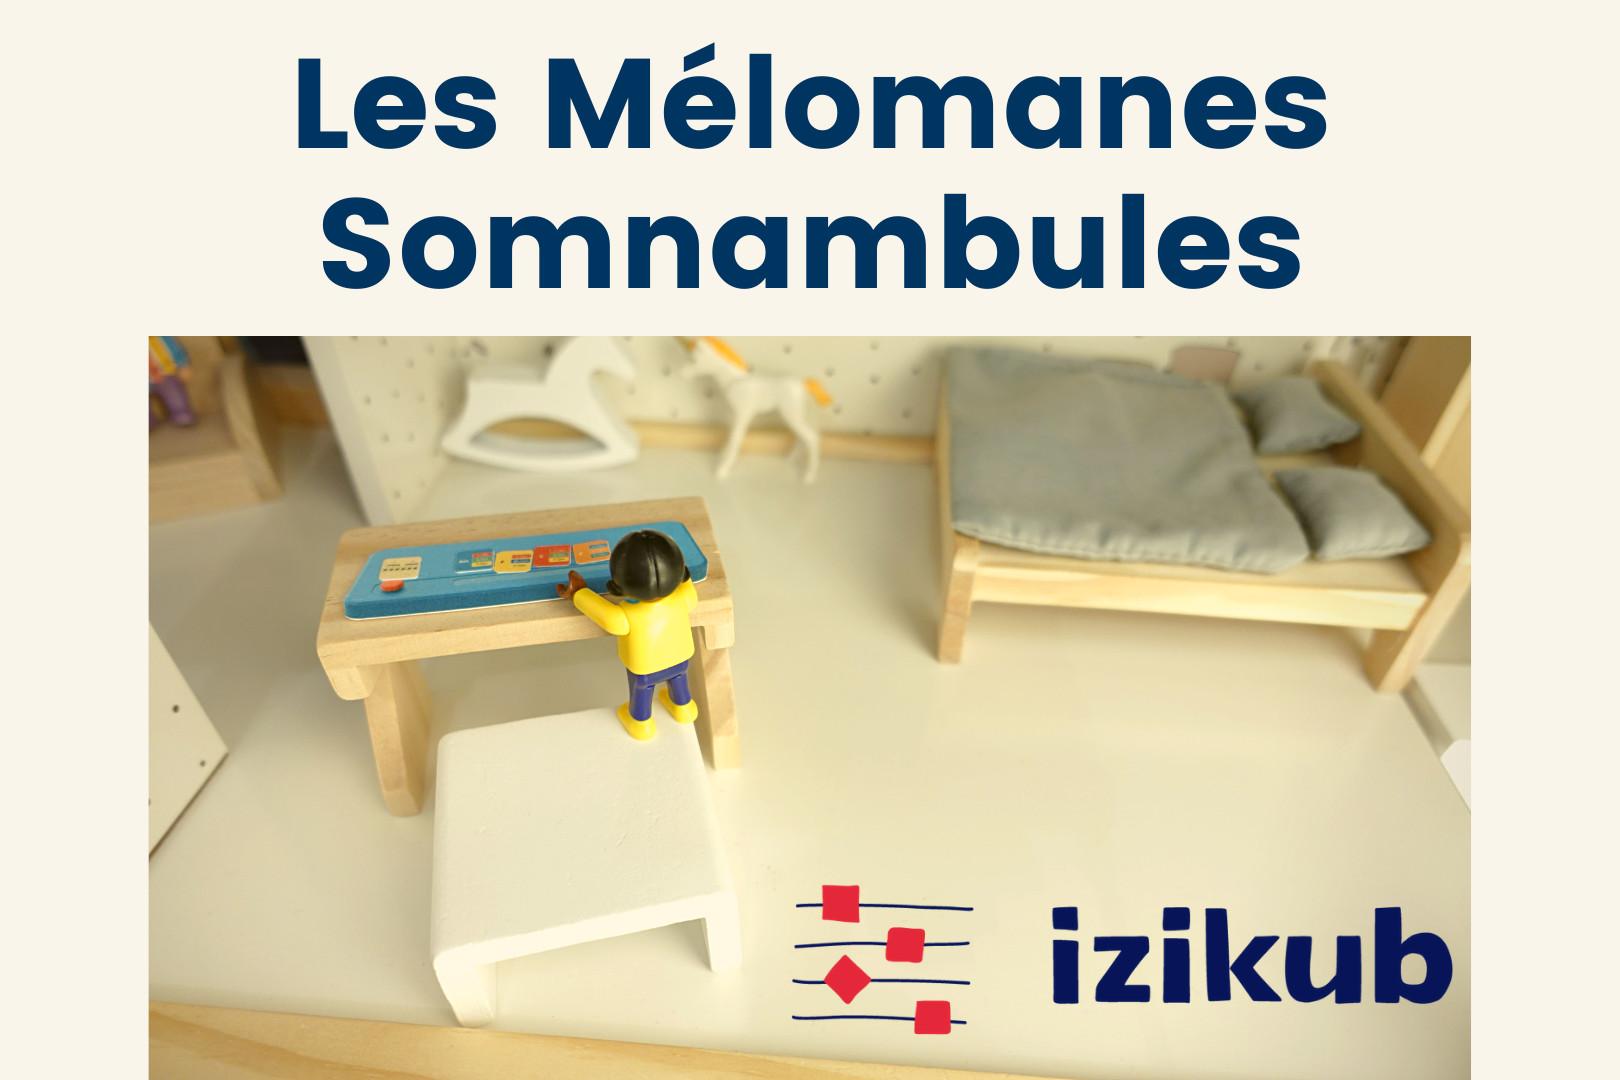 Les Mélomanes Somnambules